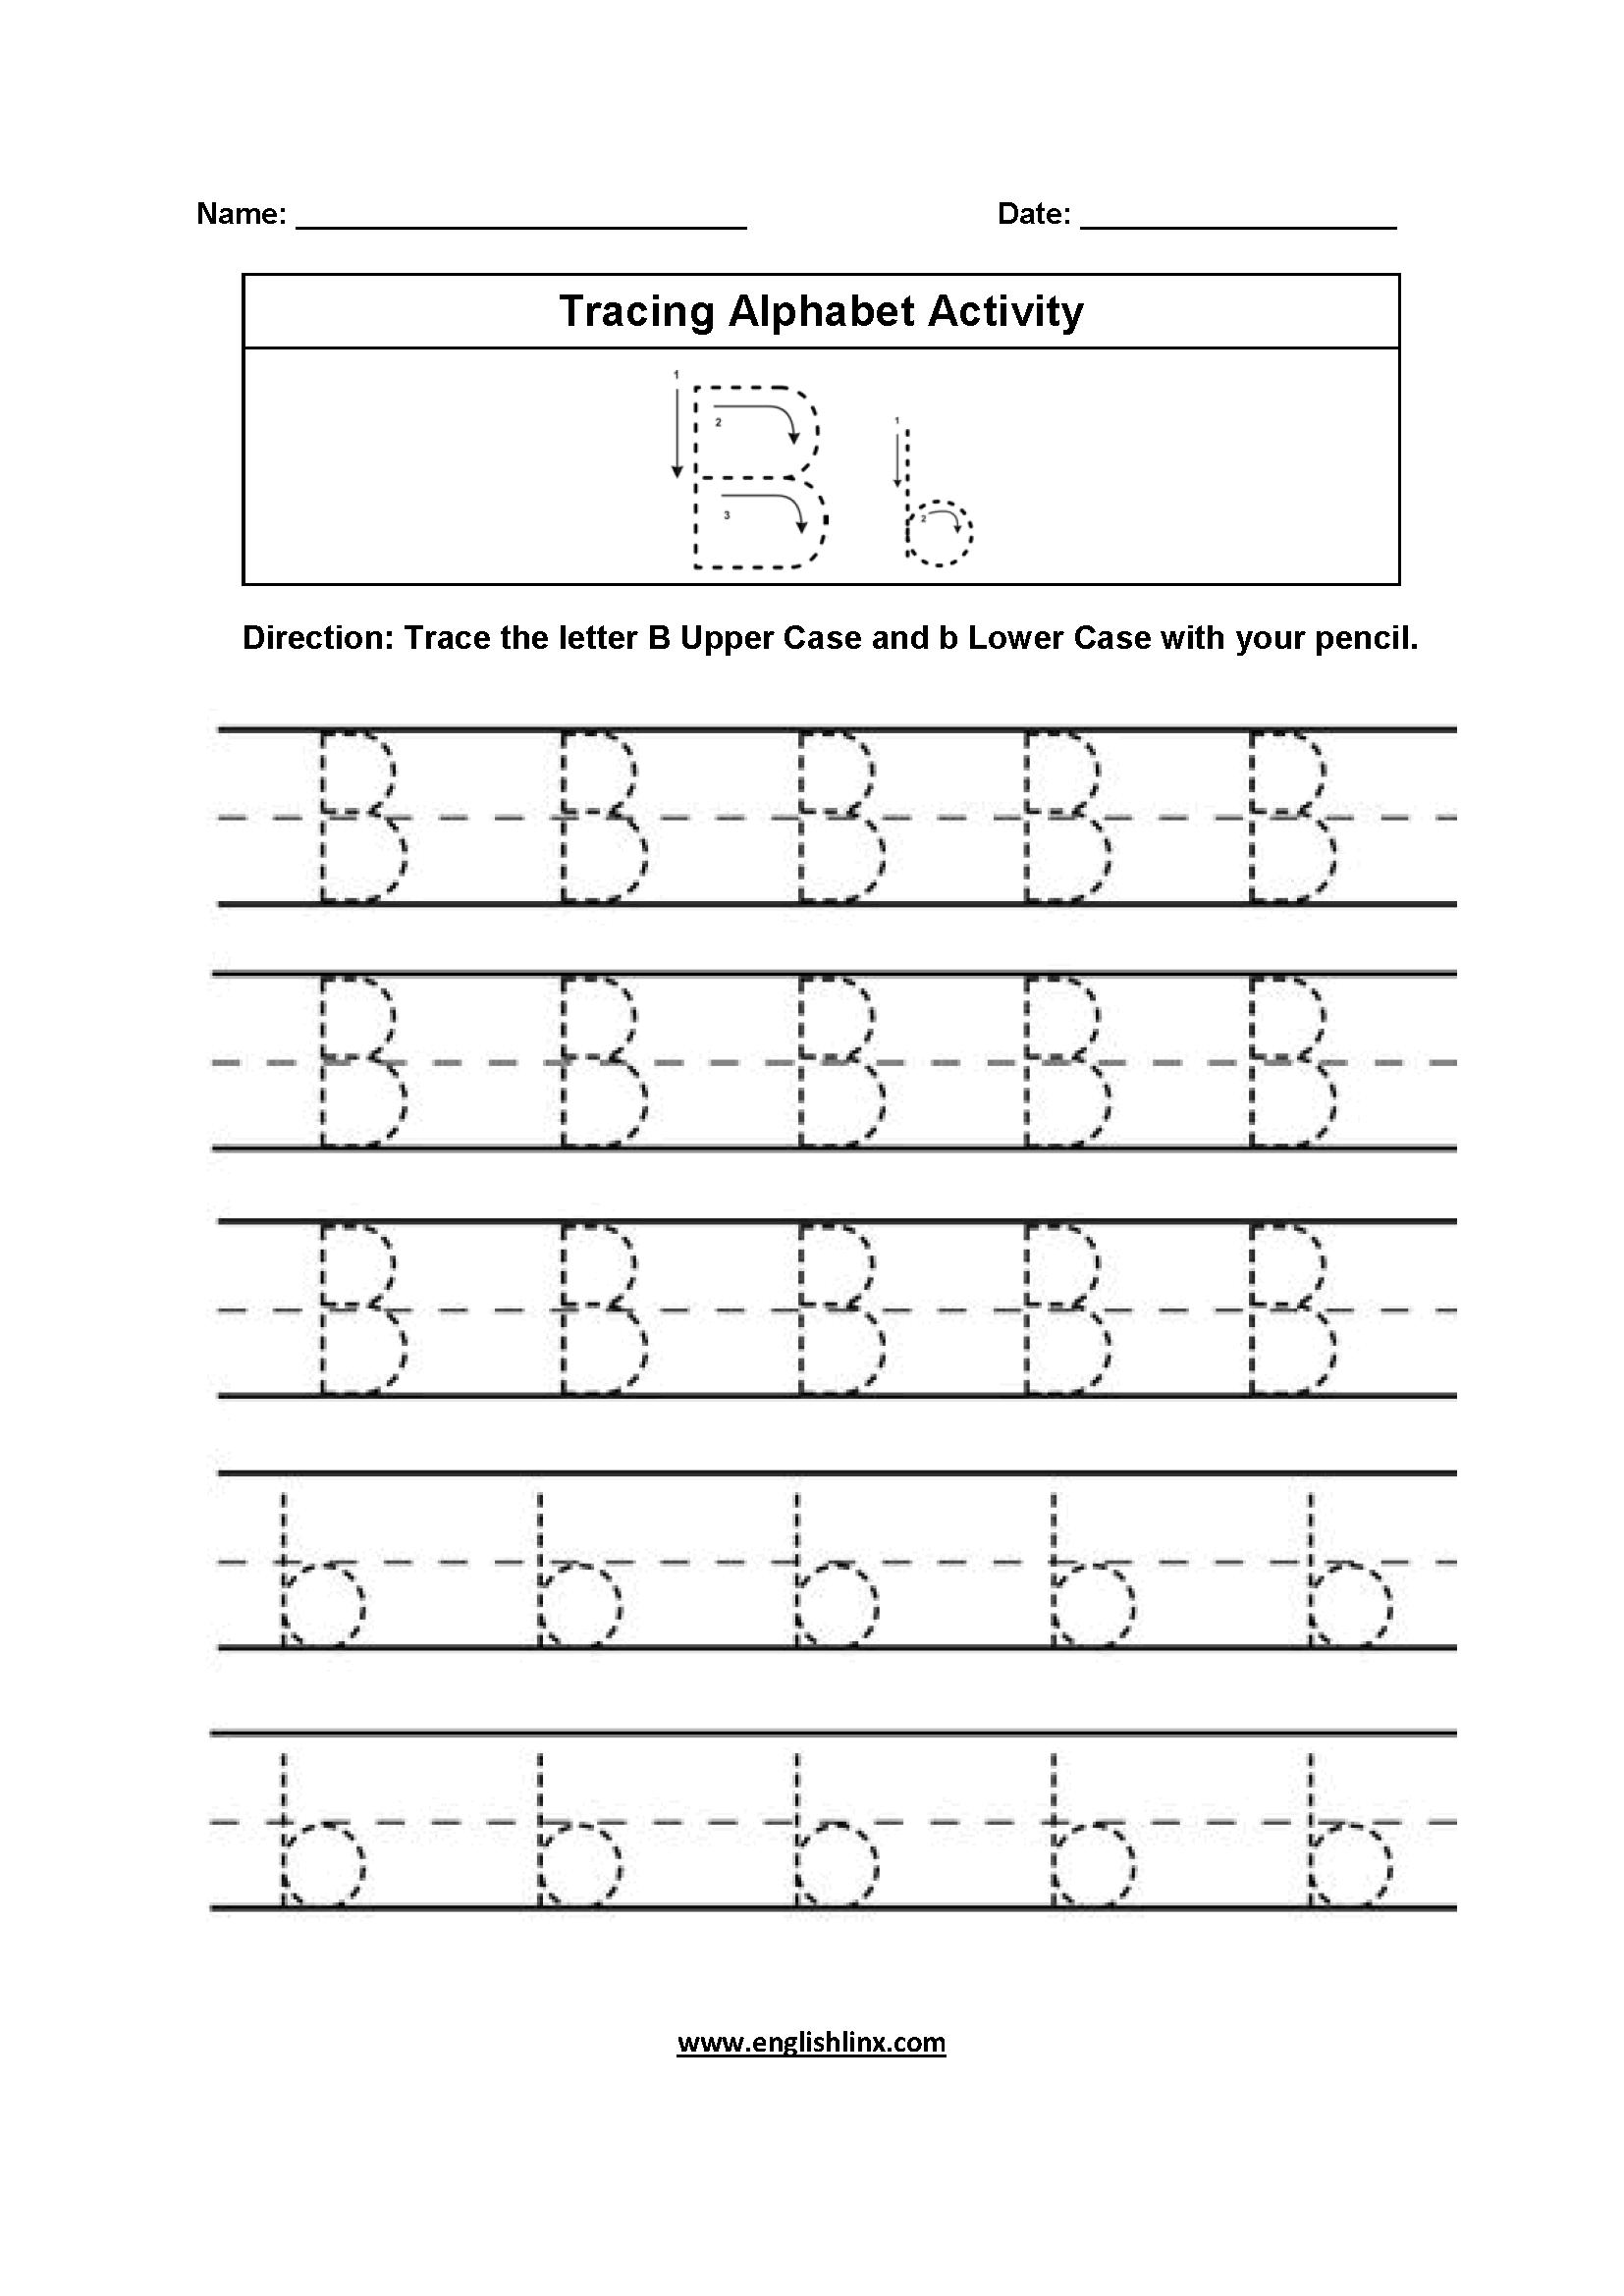 Worksheet ~ Alphabet Worksheets Tracing Worksheet Free